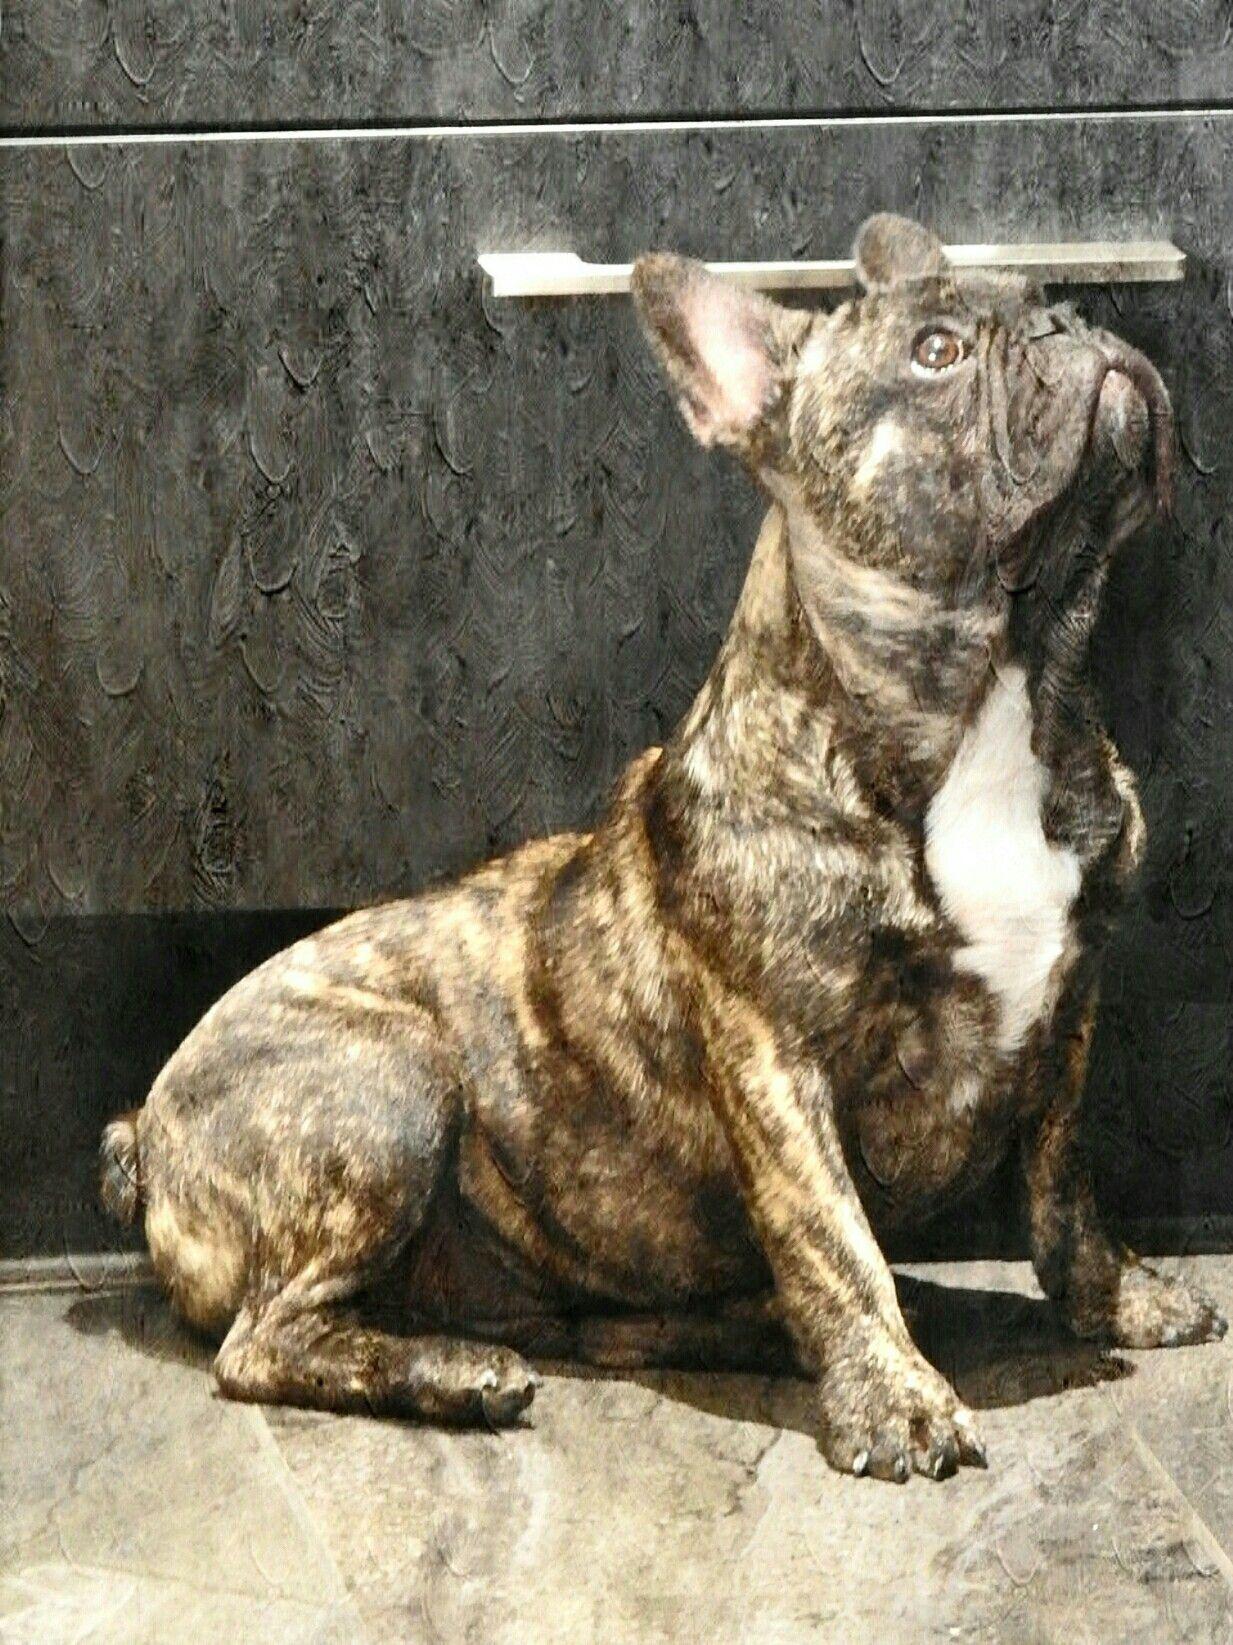 Reverse brindle French Bulldog Reuben. Photo by Gaeleen